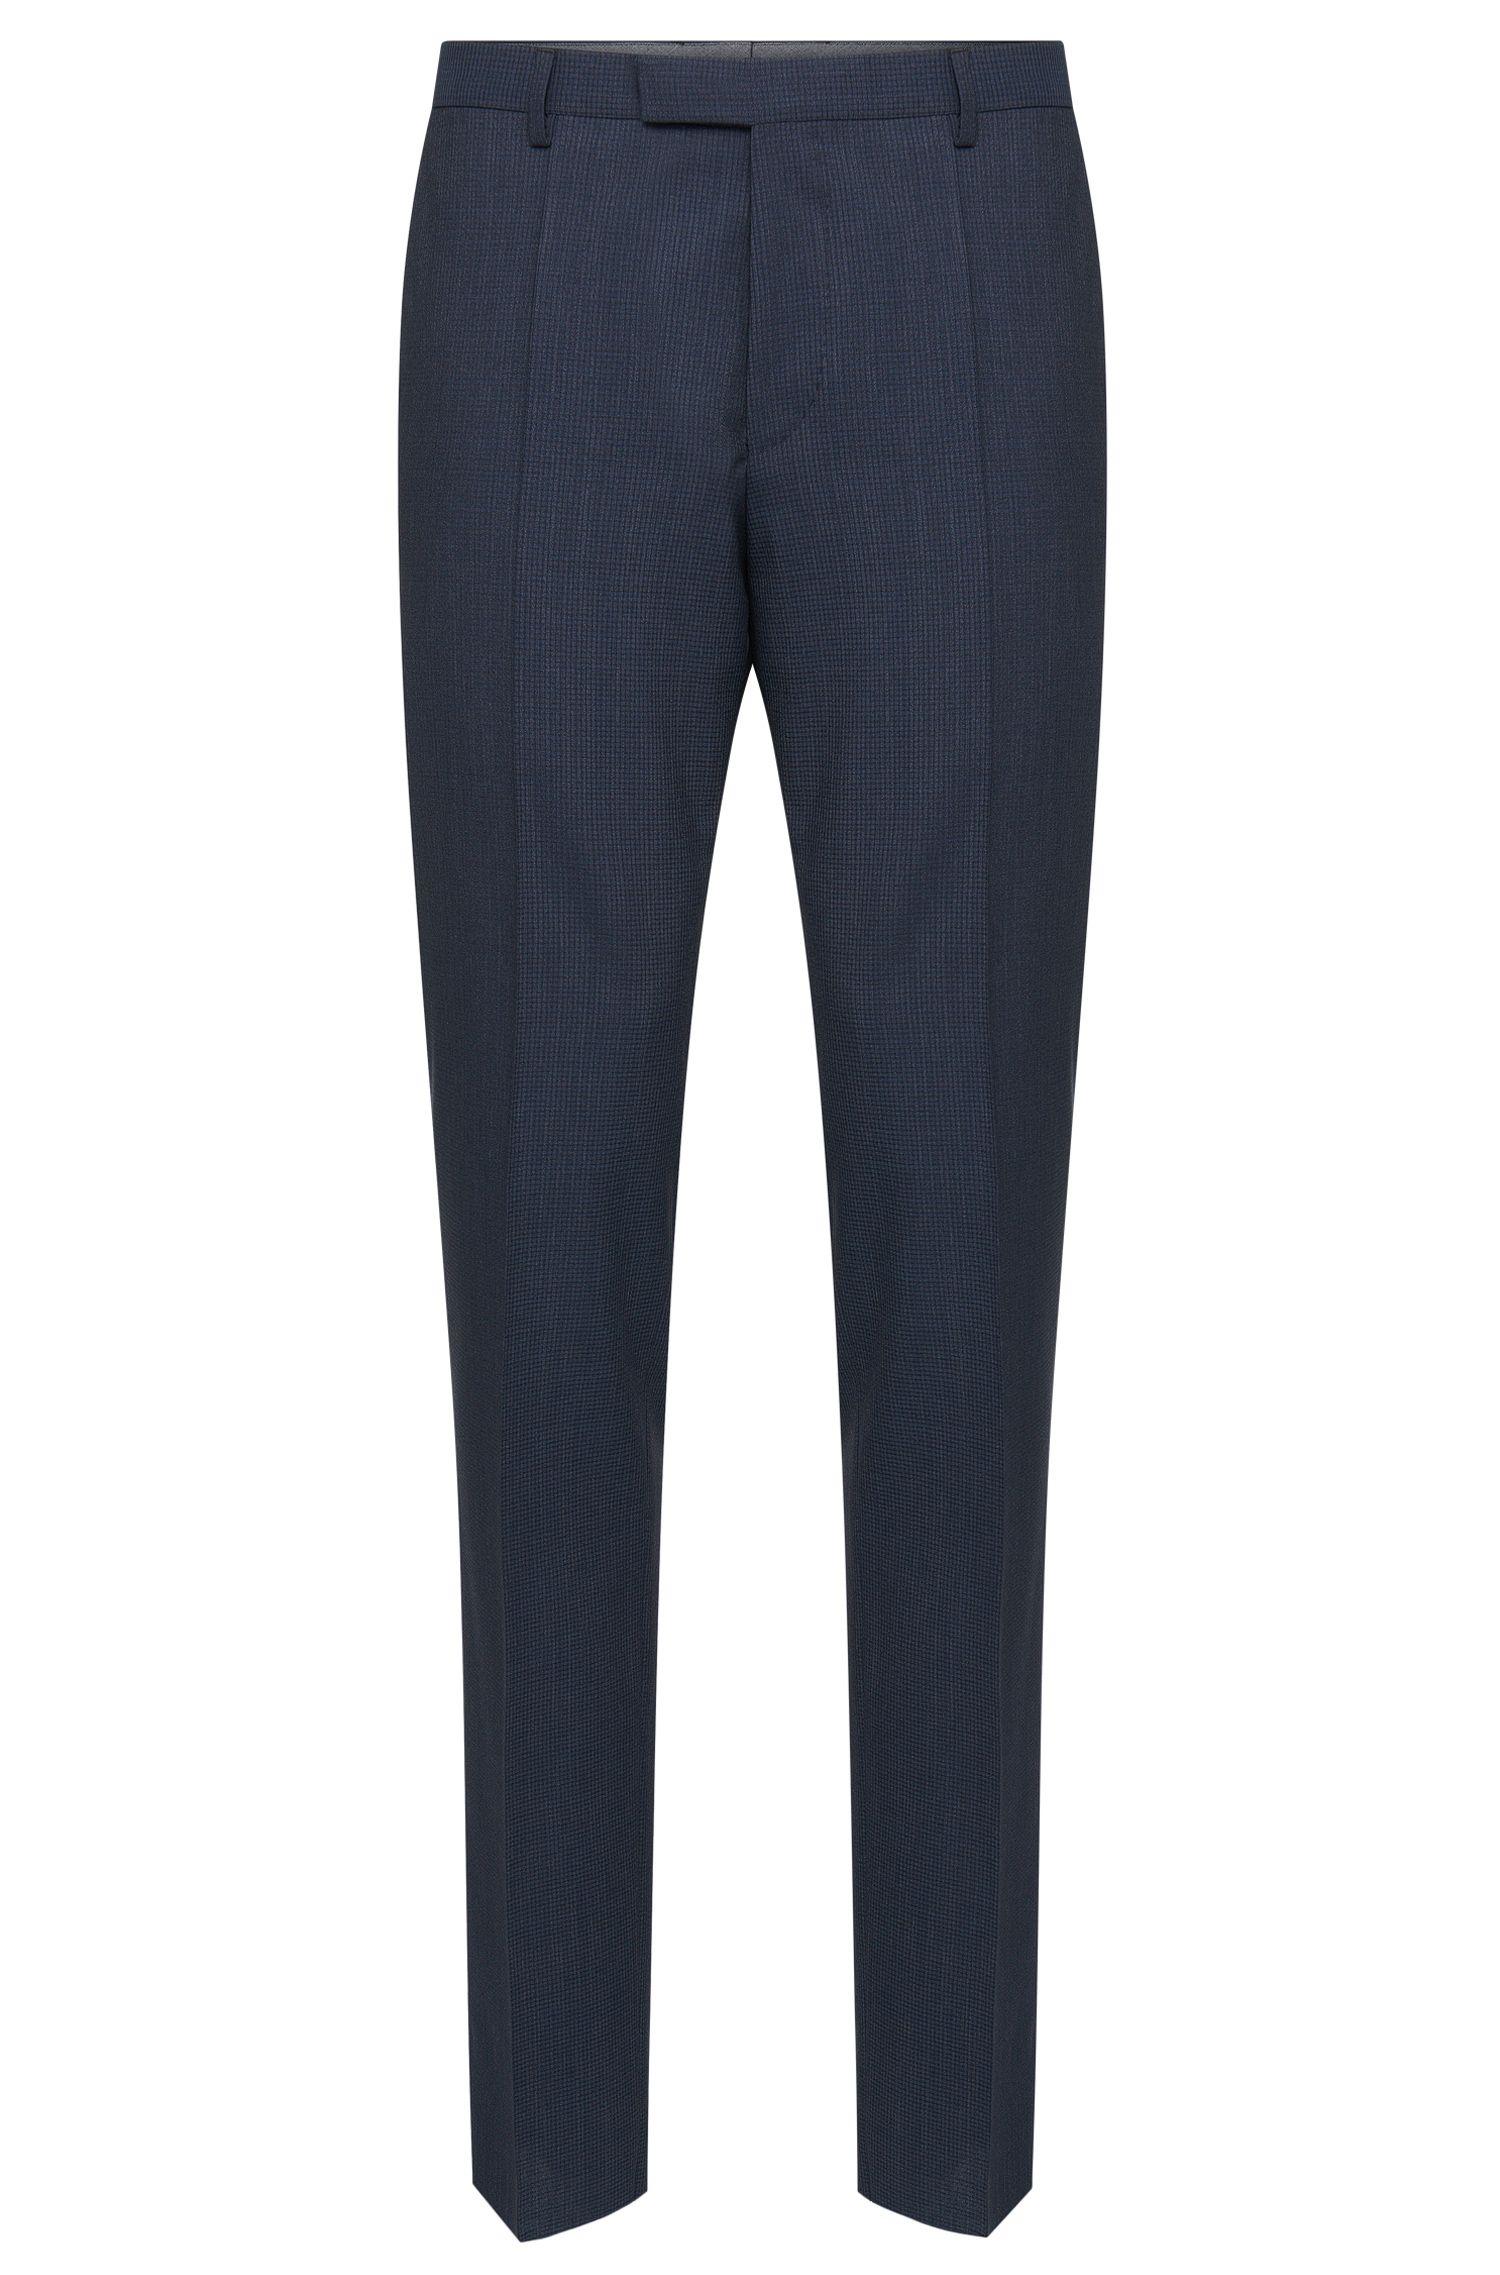 'Leenon' | Regular Fit, Super 100 Virgin Wool Check Dress Pants